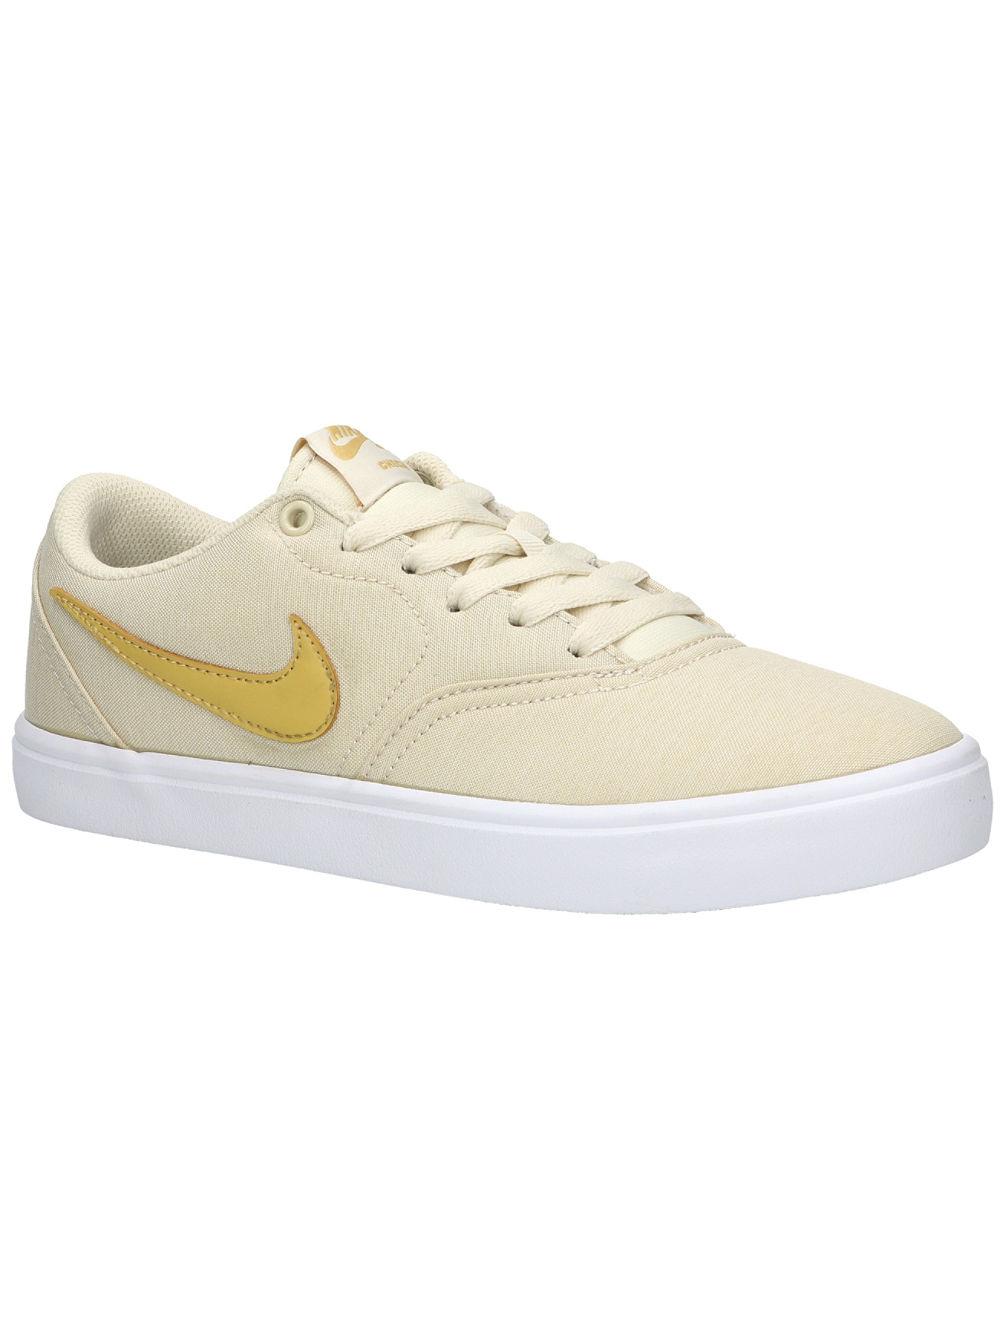 038dd86856 Buy Nike SB Check Solarsoft Canvas Premium Sneakers W online at  blue-tomato.com